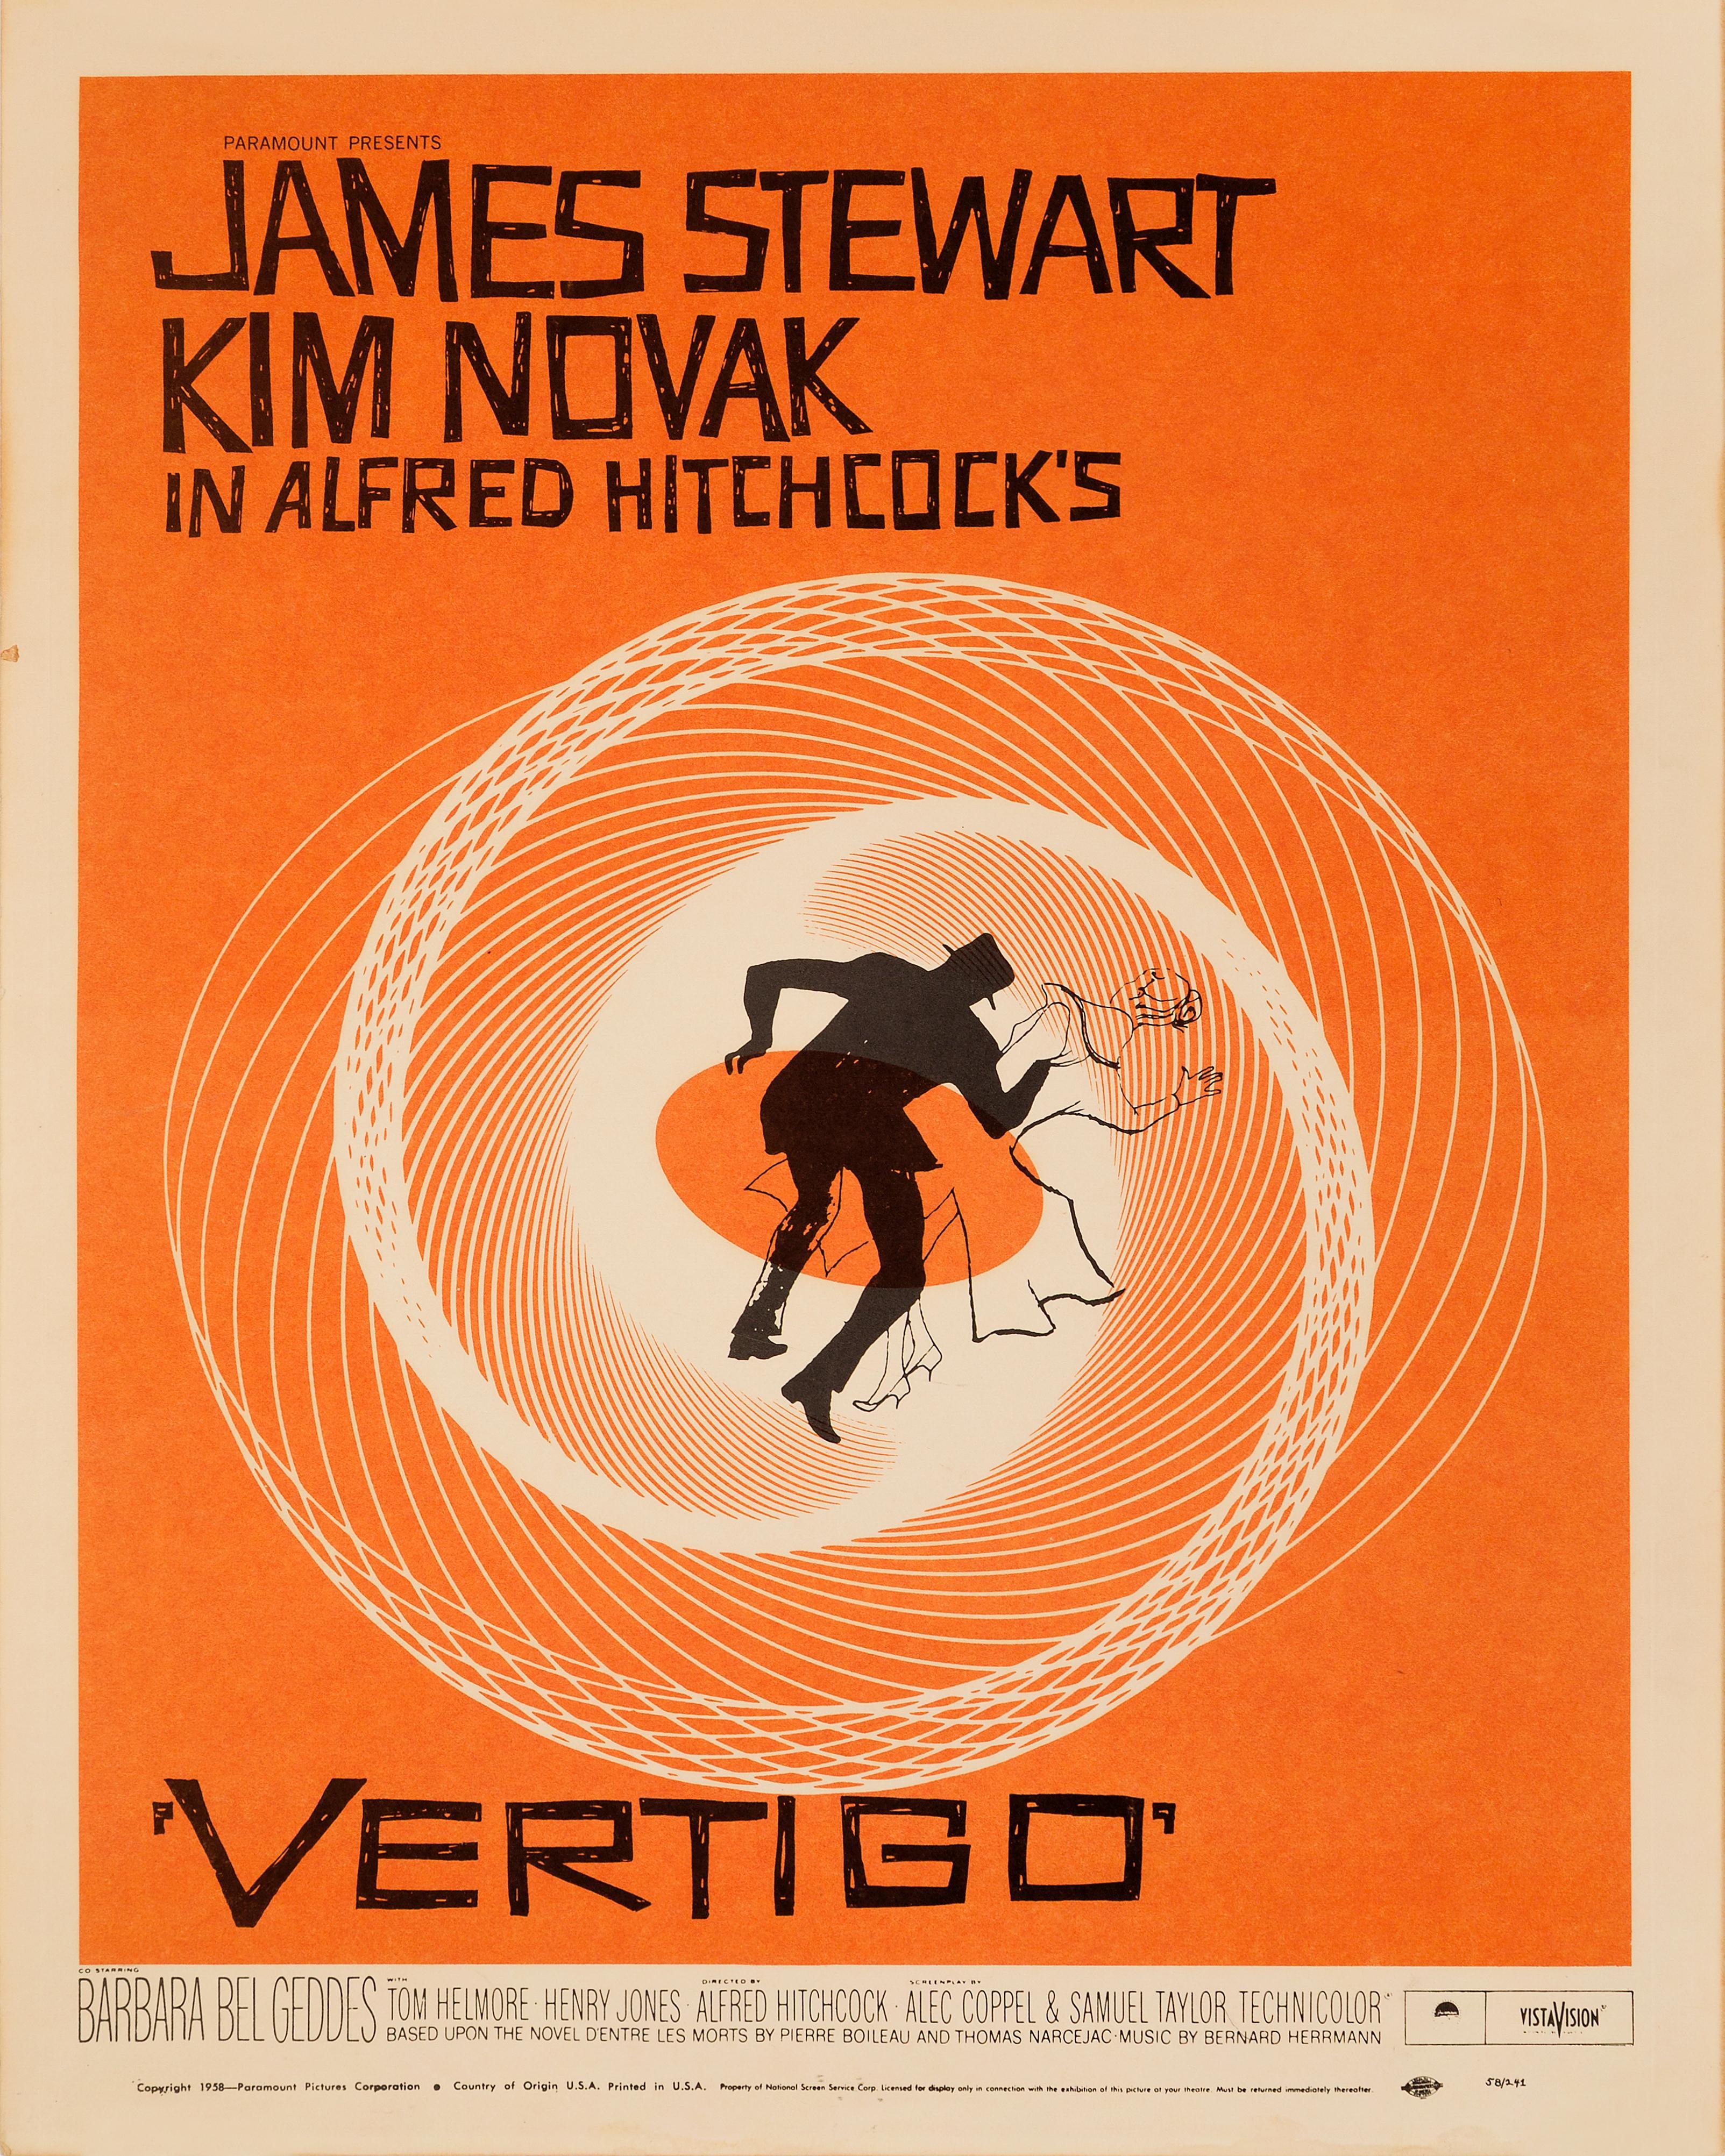 Vertigo' Original Vintage US Window Card Movie Poster, 1958 at 1stDibs